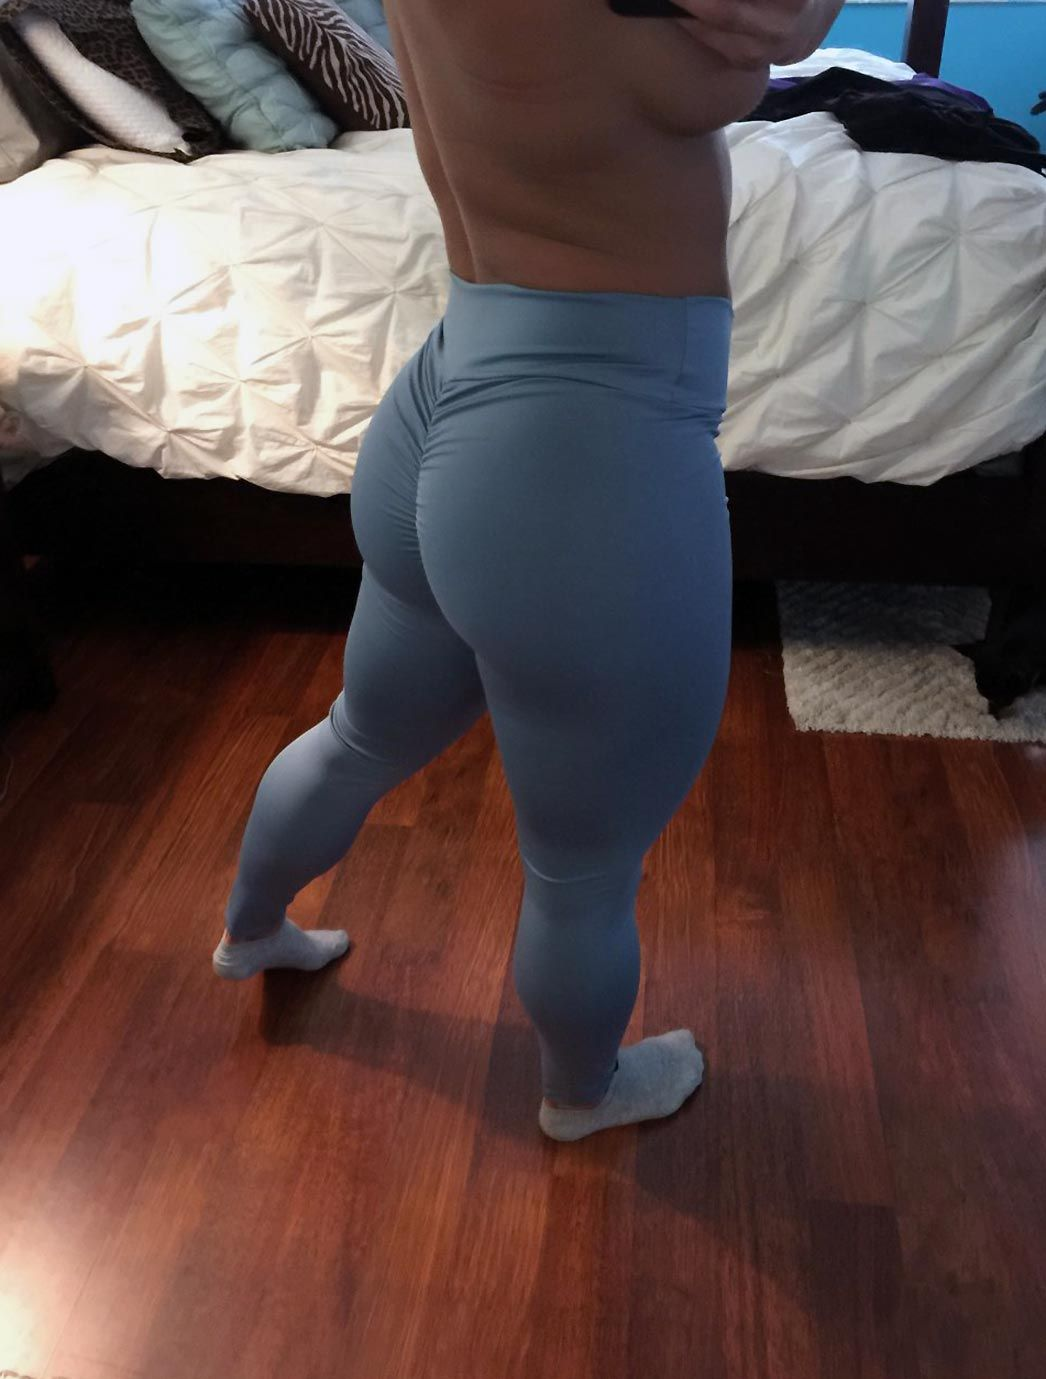 Celeste Bonin Nude Leaked The Fappening & Sexy 0200